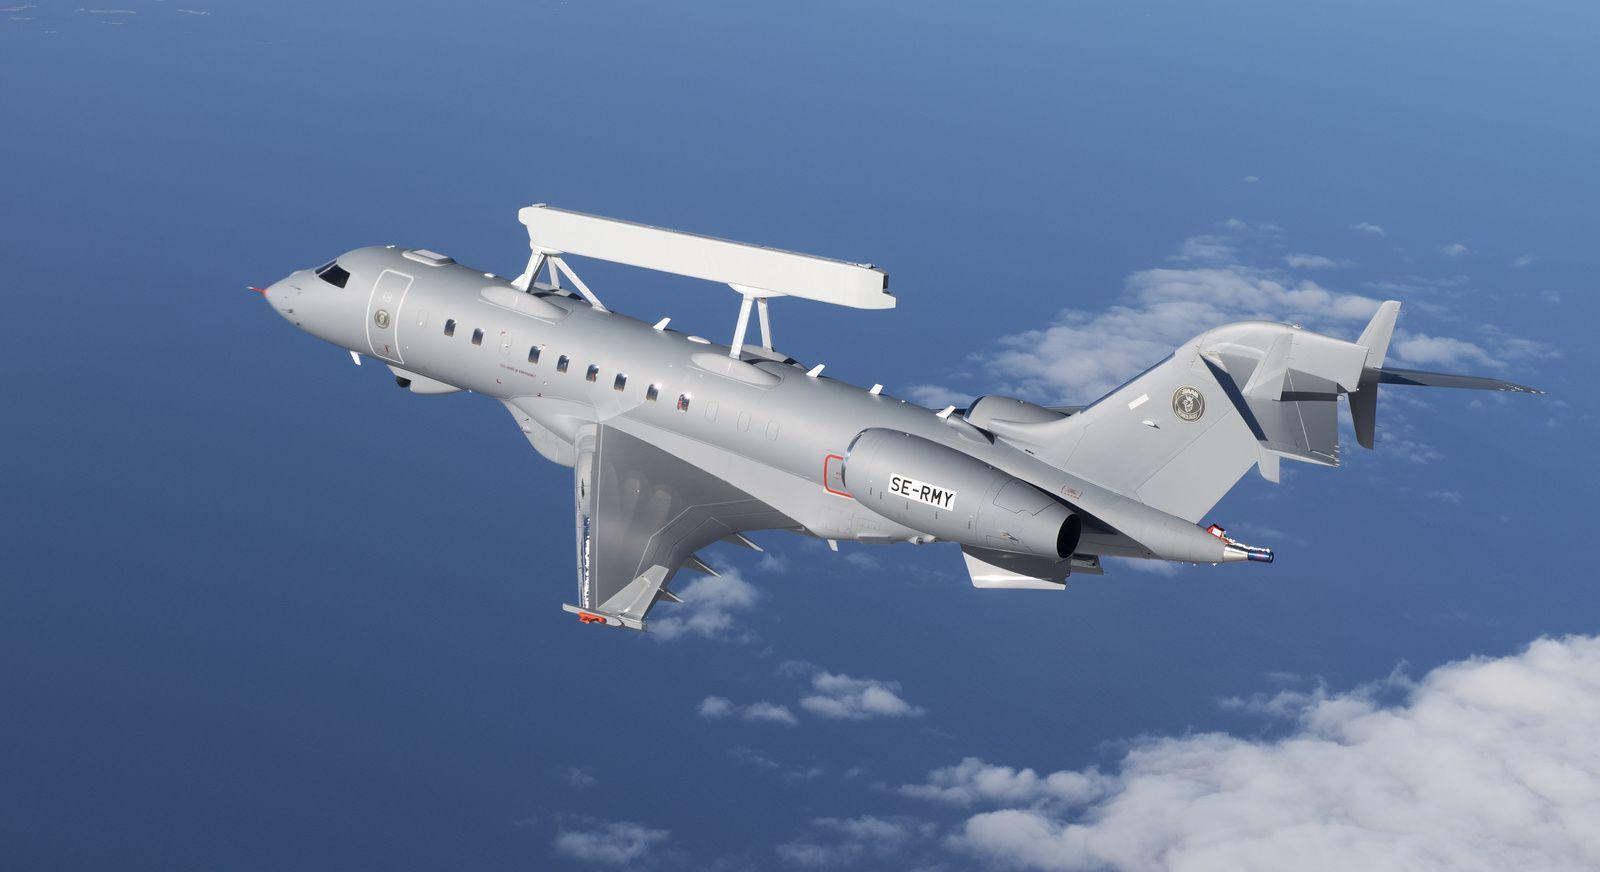 Saab propose son avion d'alerte avancée GlobalEye à la Finlande